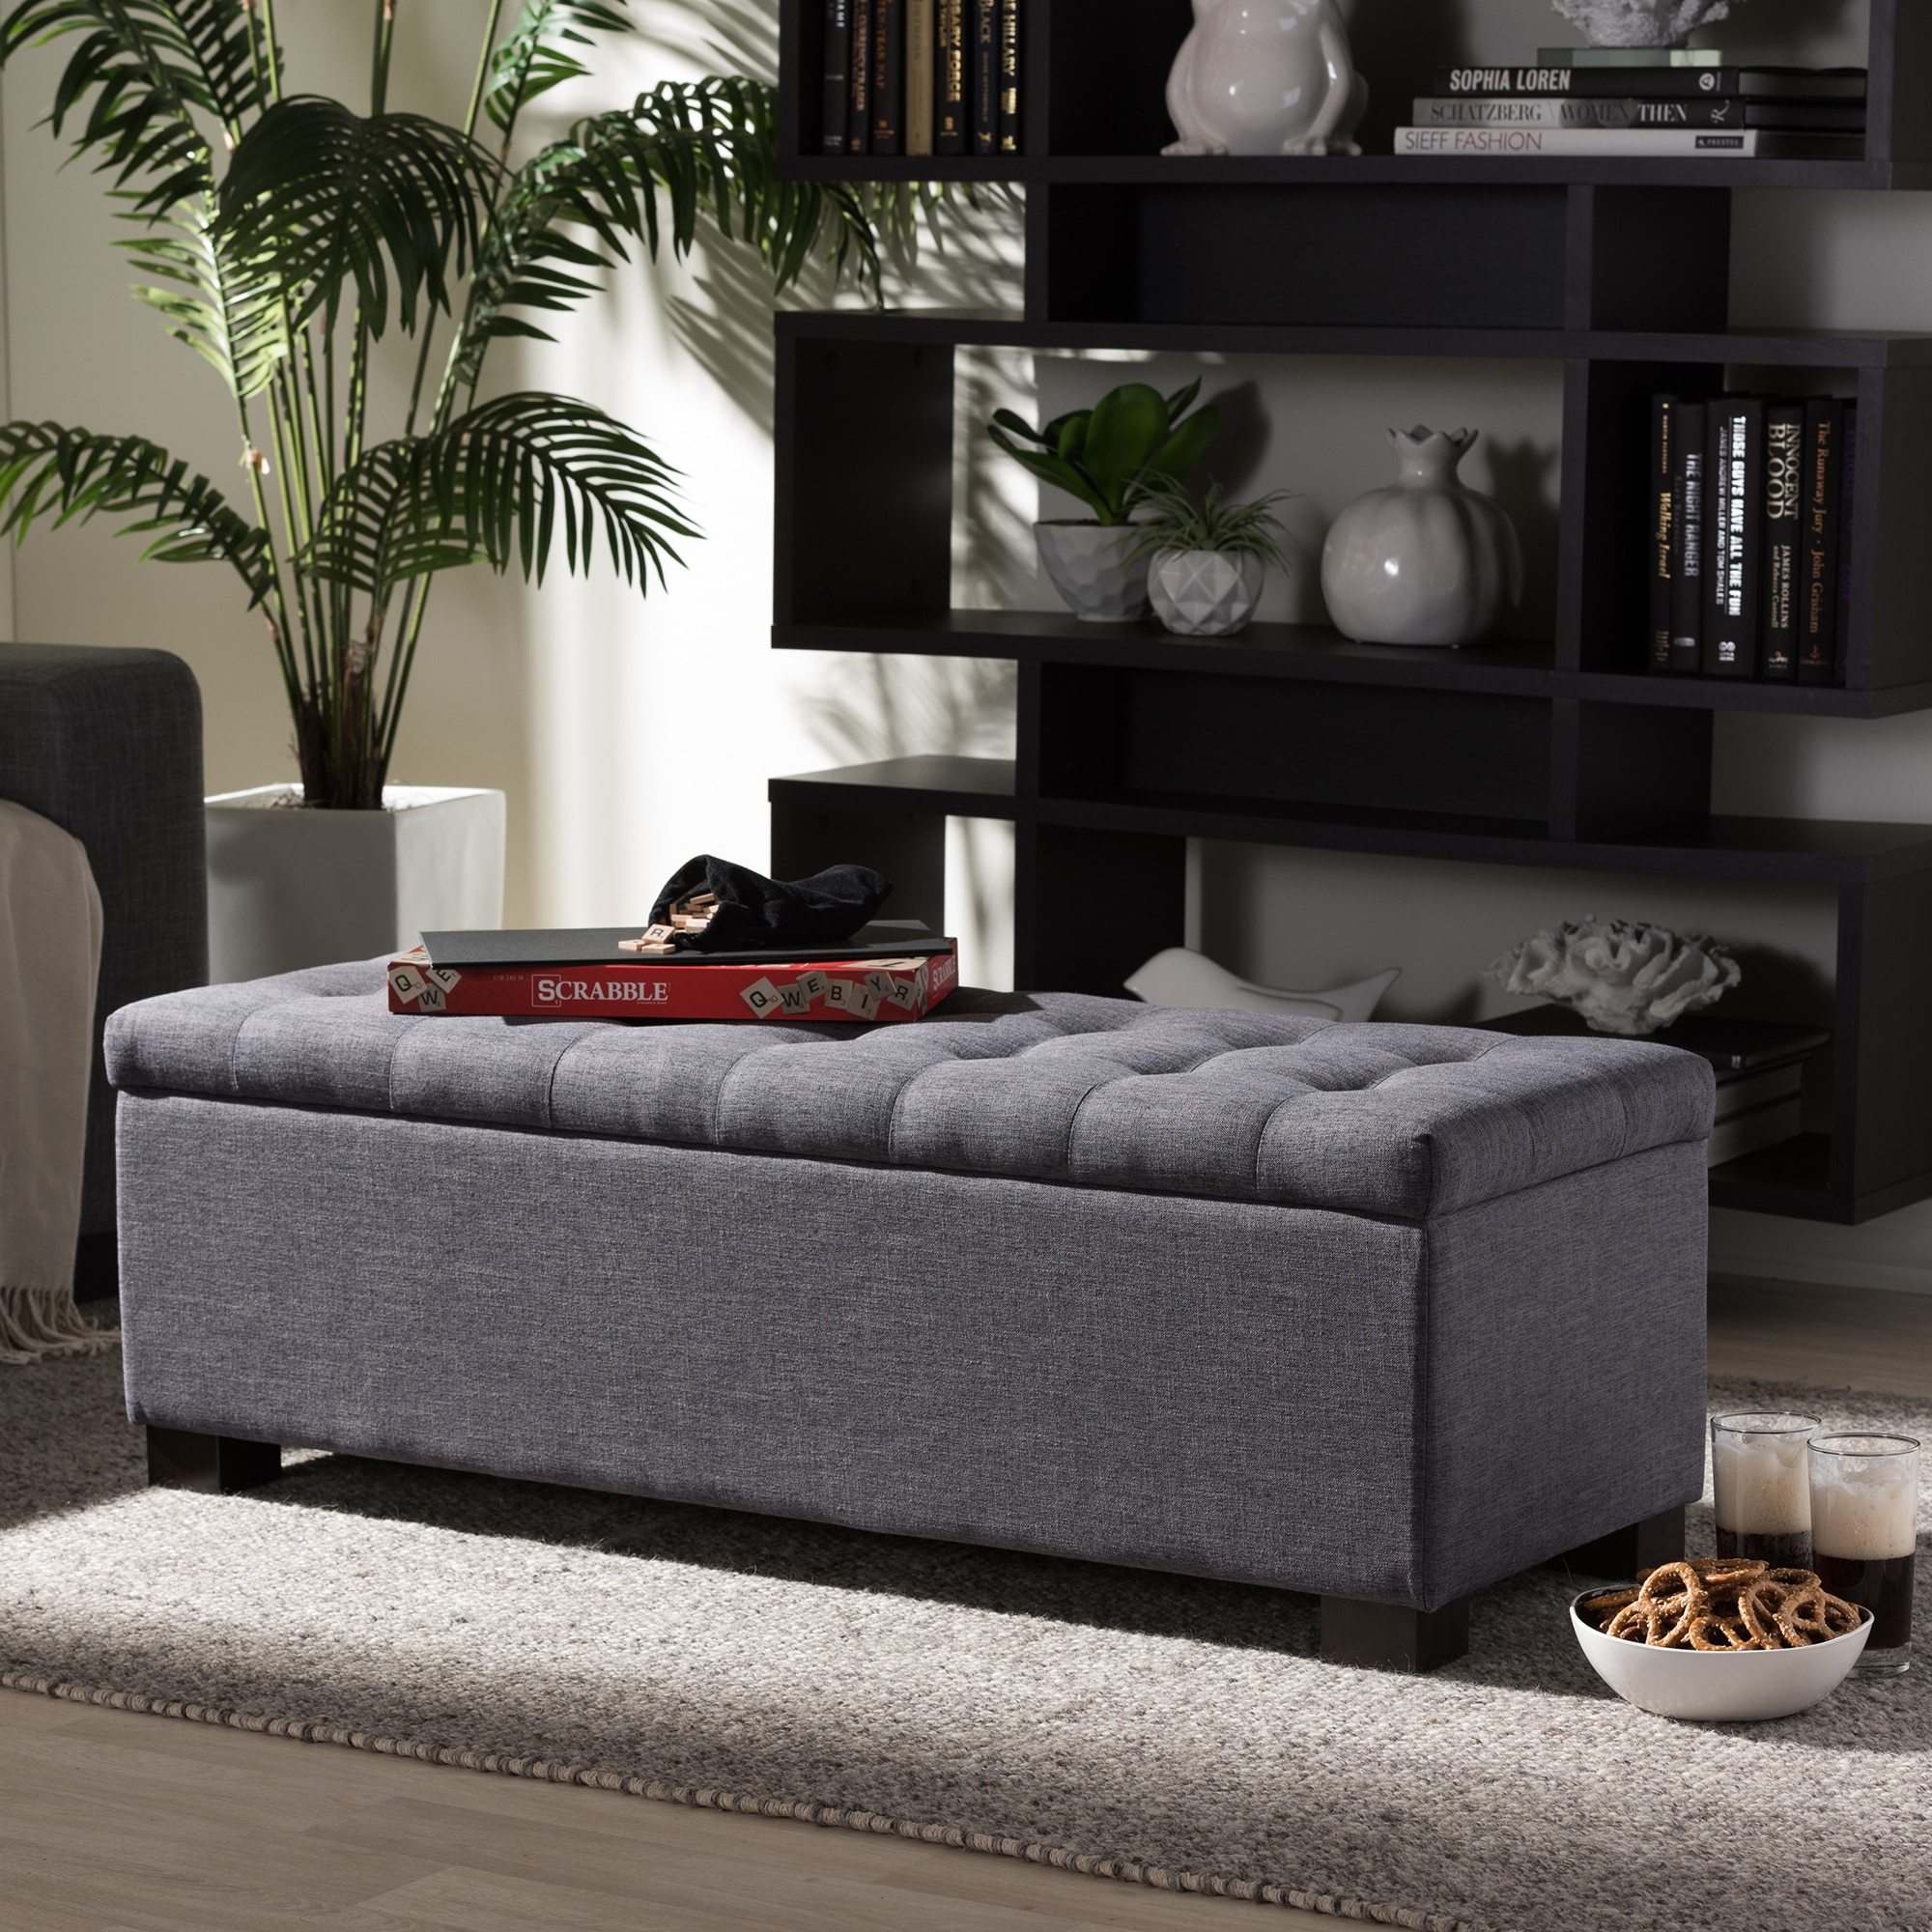 Baxton Studio Alcmene Modern And Contemporary Dark Grey Fabric Upholstered Grid Tufting Storage Ottoman Bench